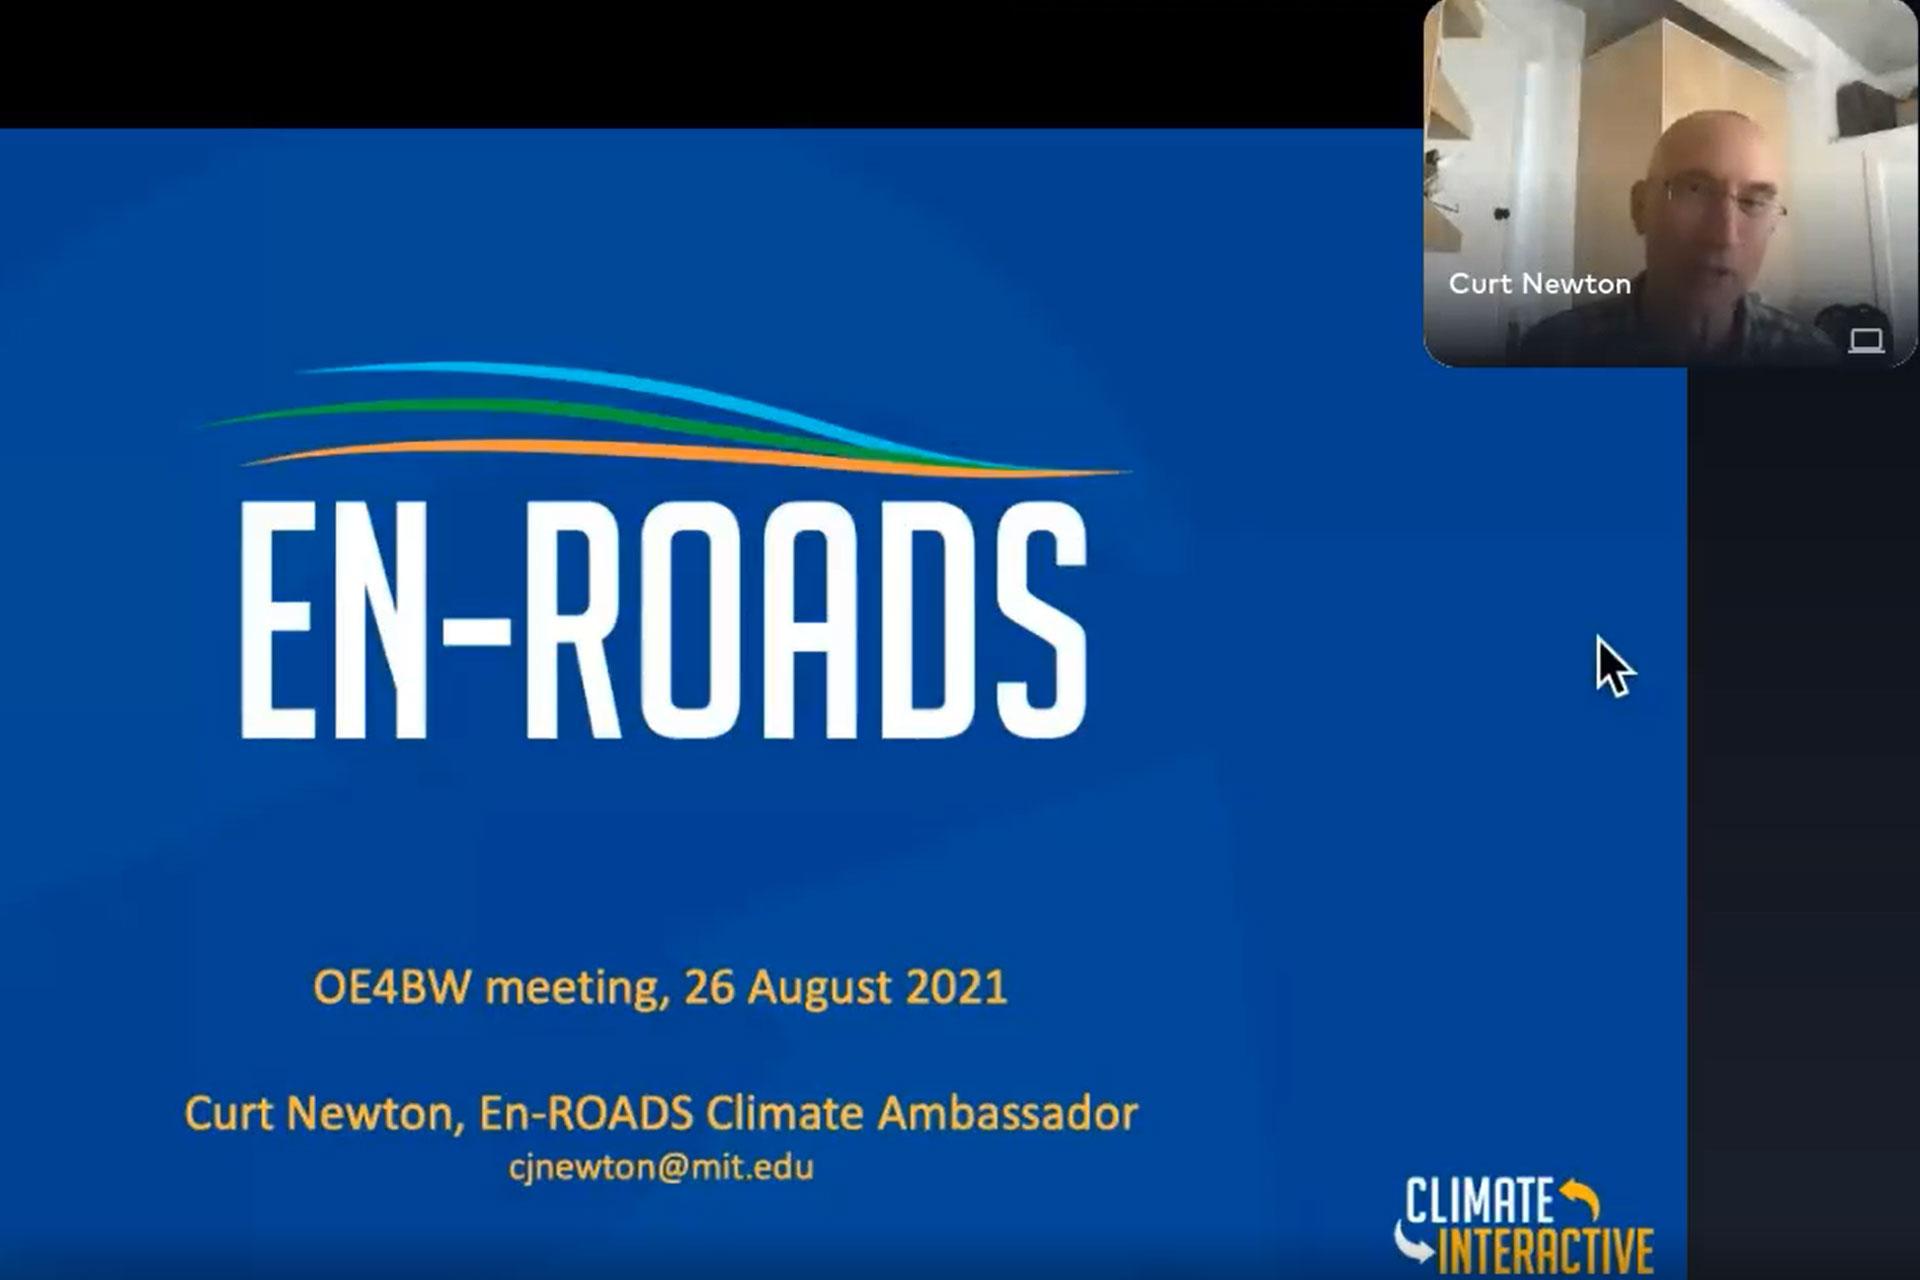 EN-ROADS Climate Change Solutions Simulator presentation by Curt Newton